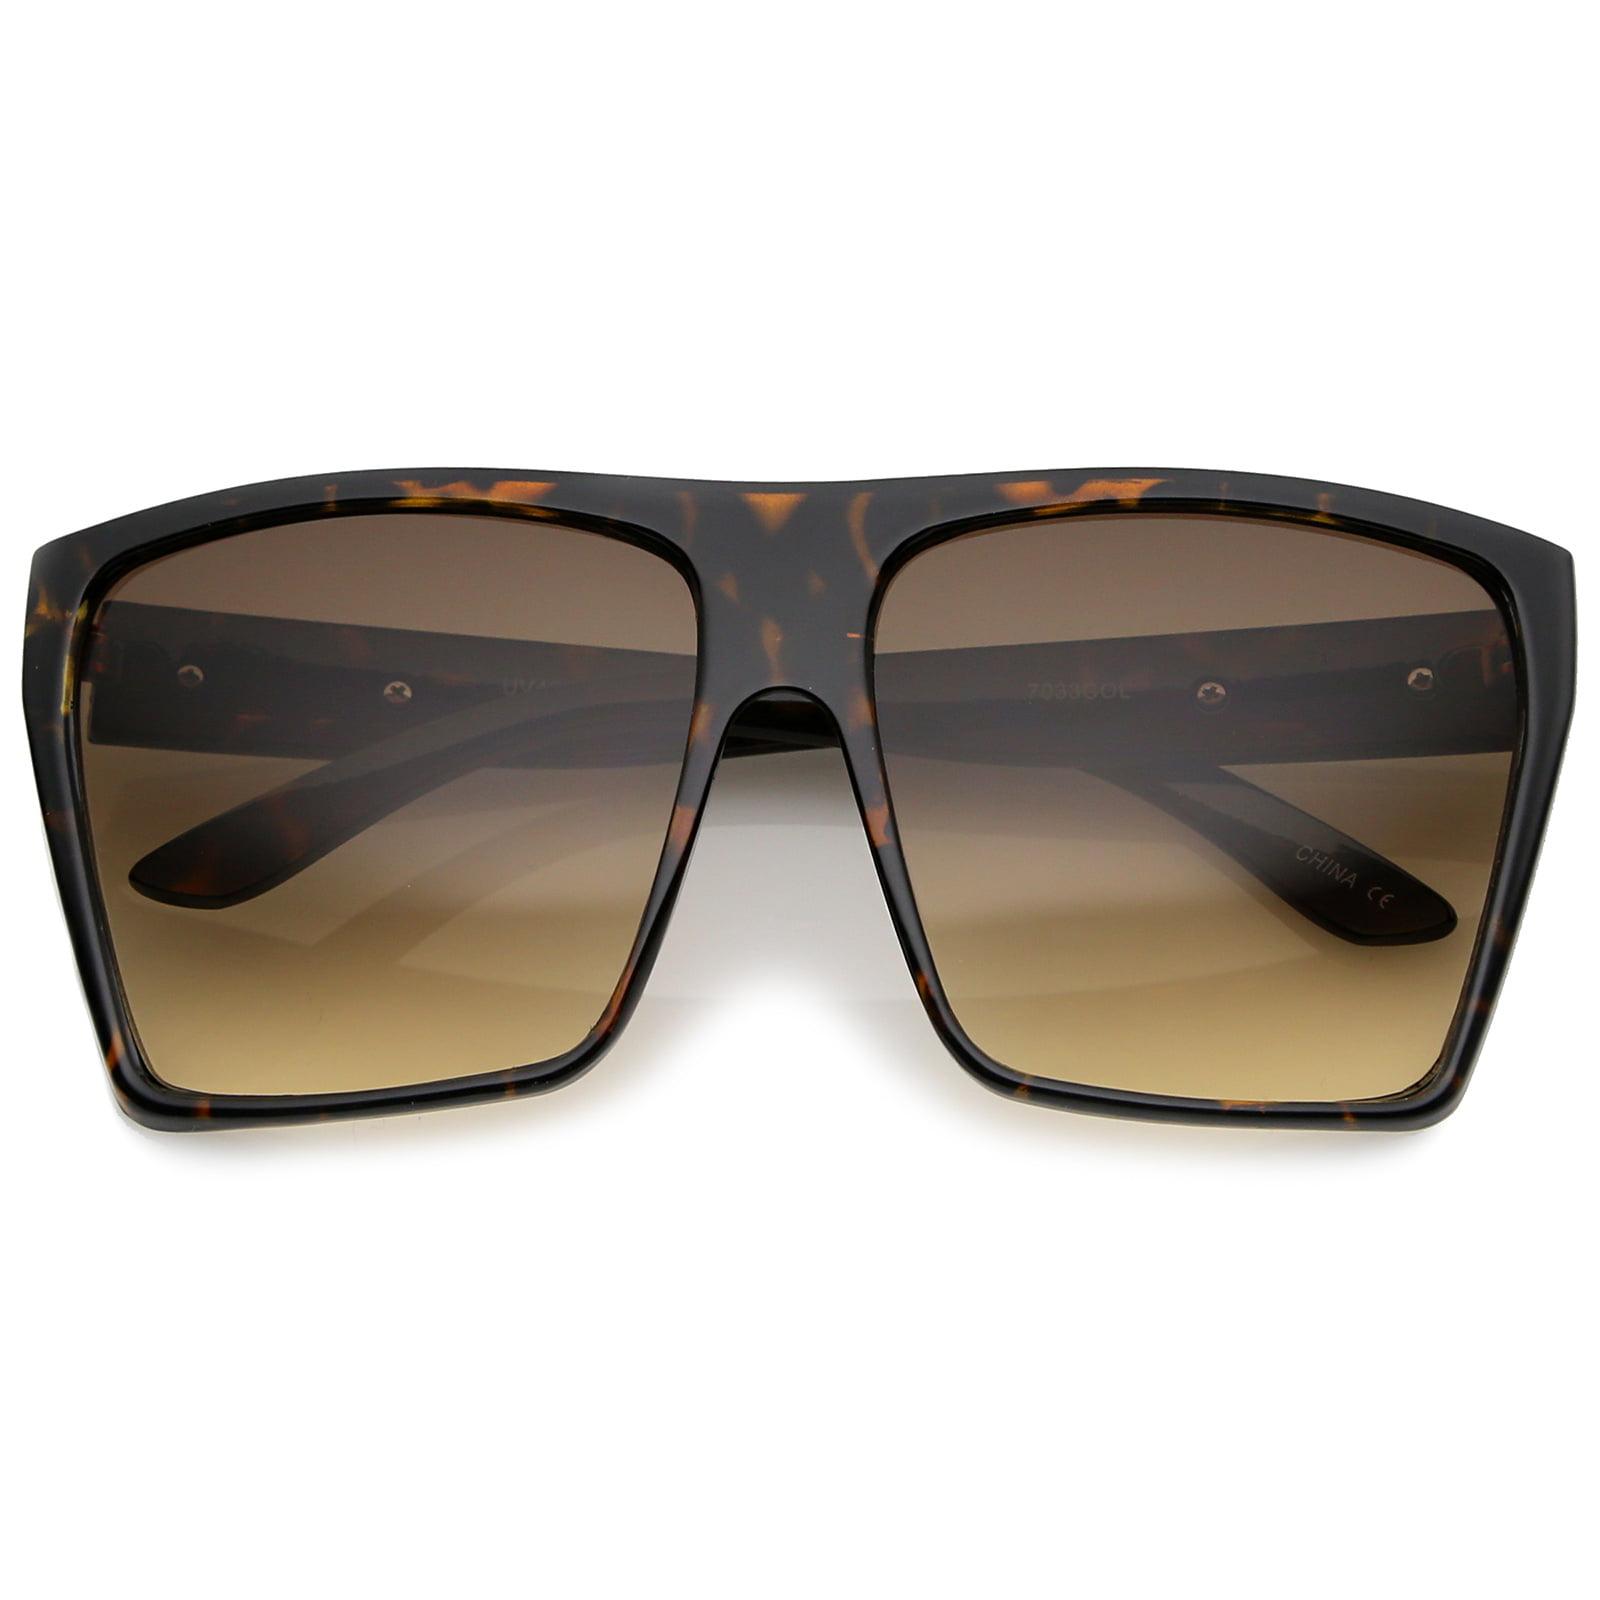 sunglassLA - Oversize Flat Top Metal Temple Accent Gradient Lens Square Sunglasses 62mm - 62mm